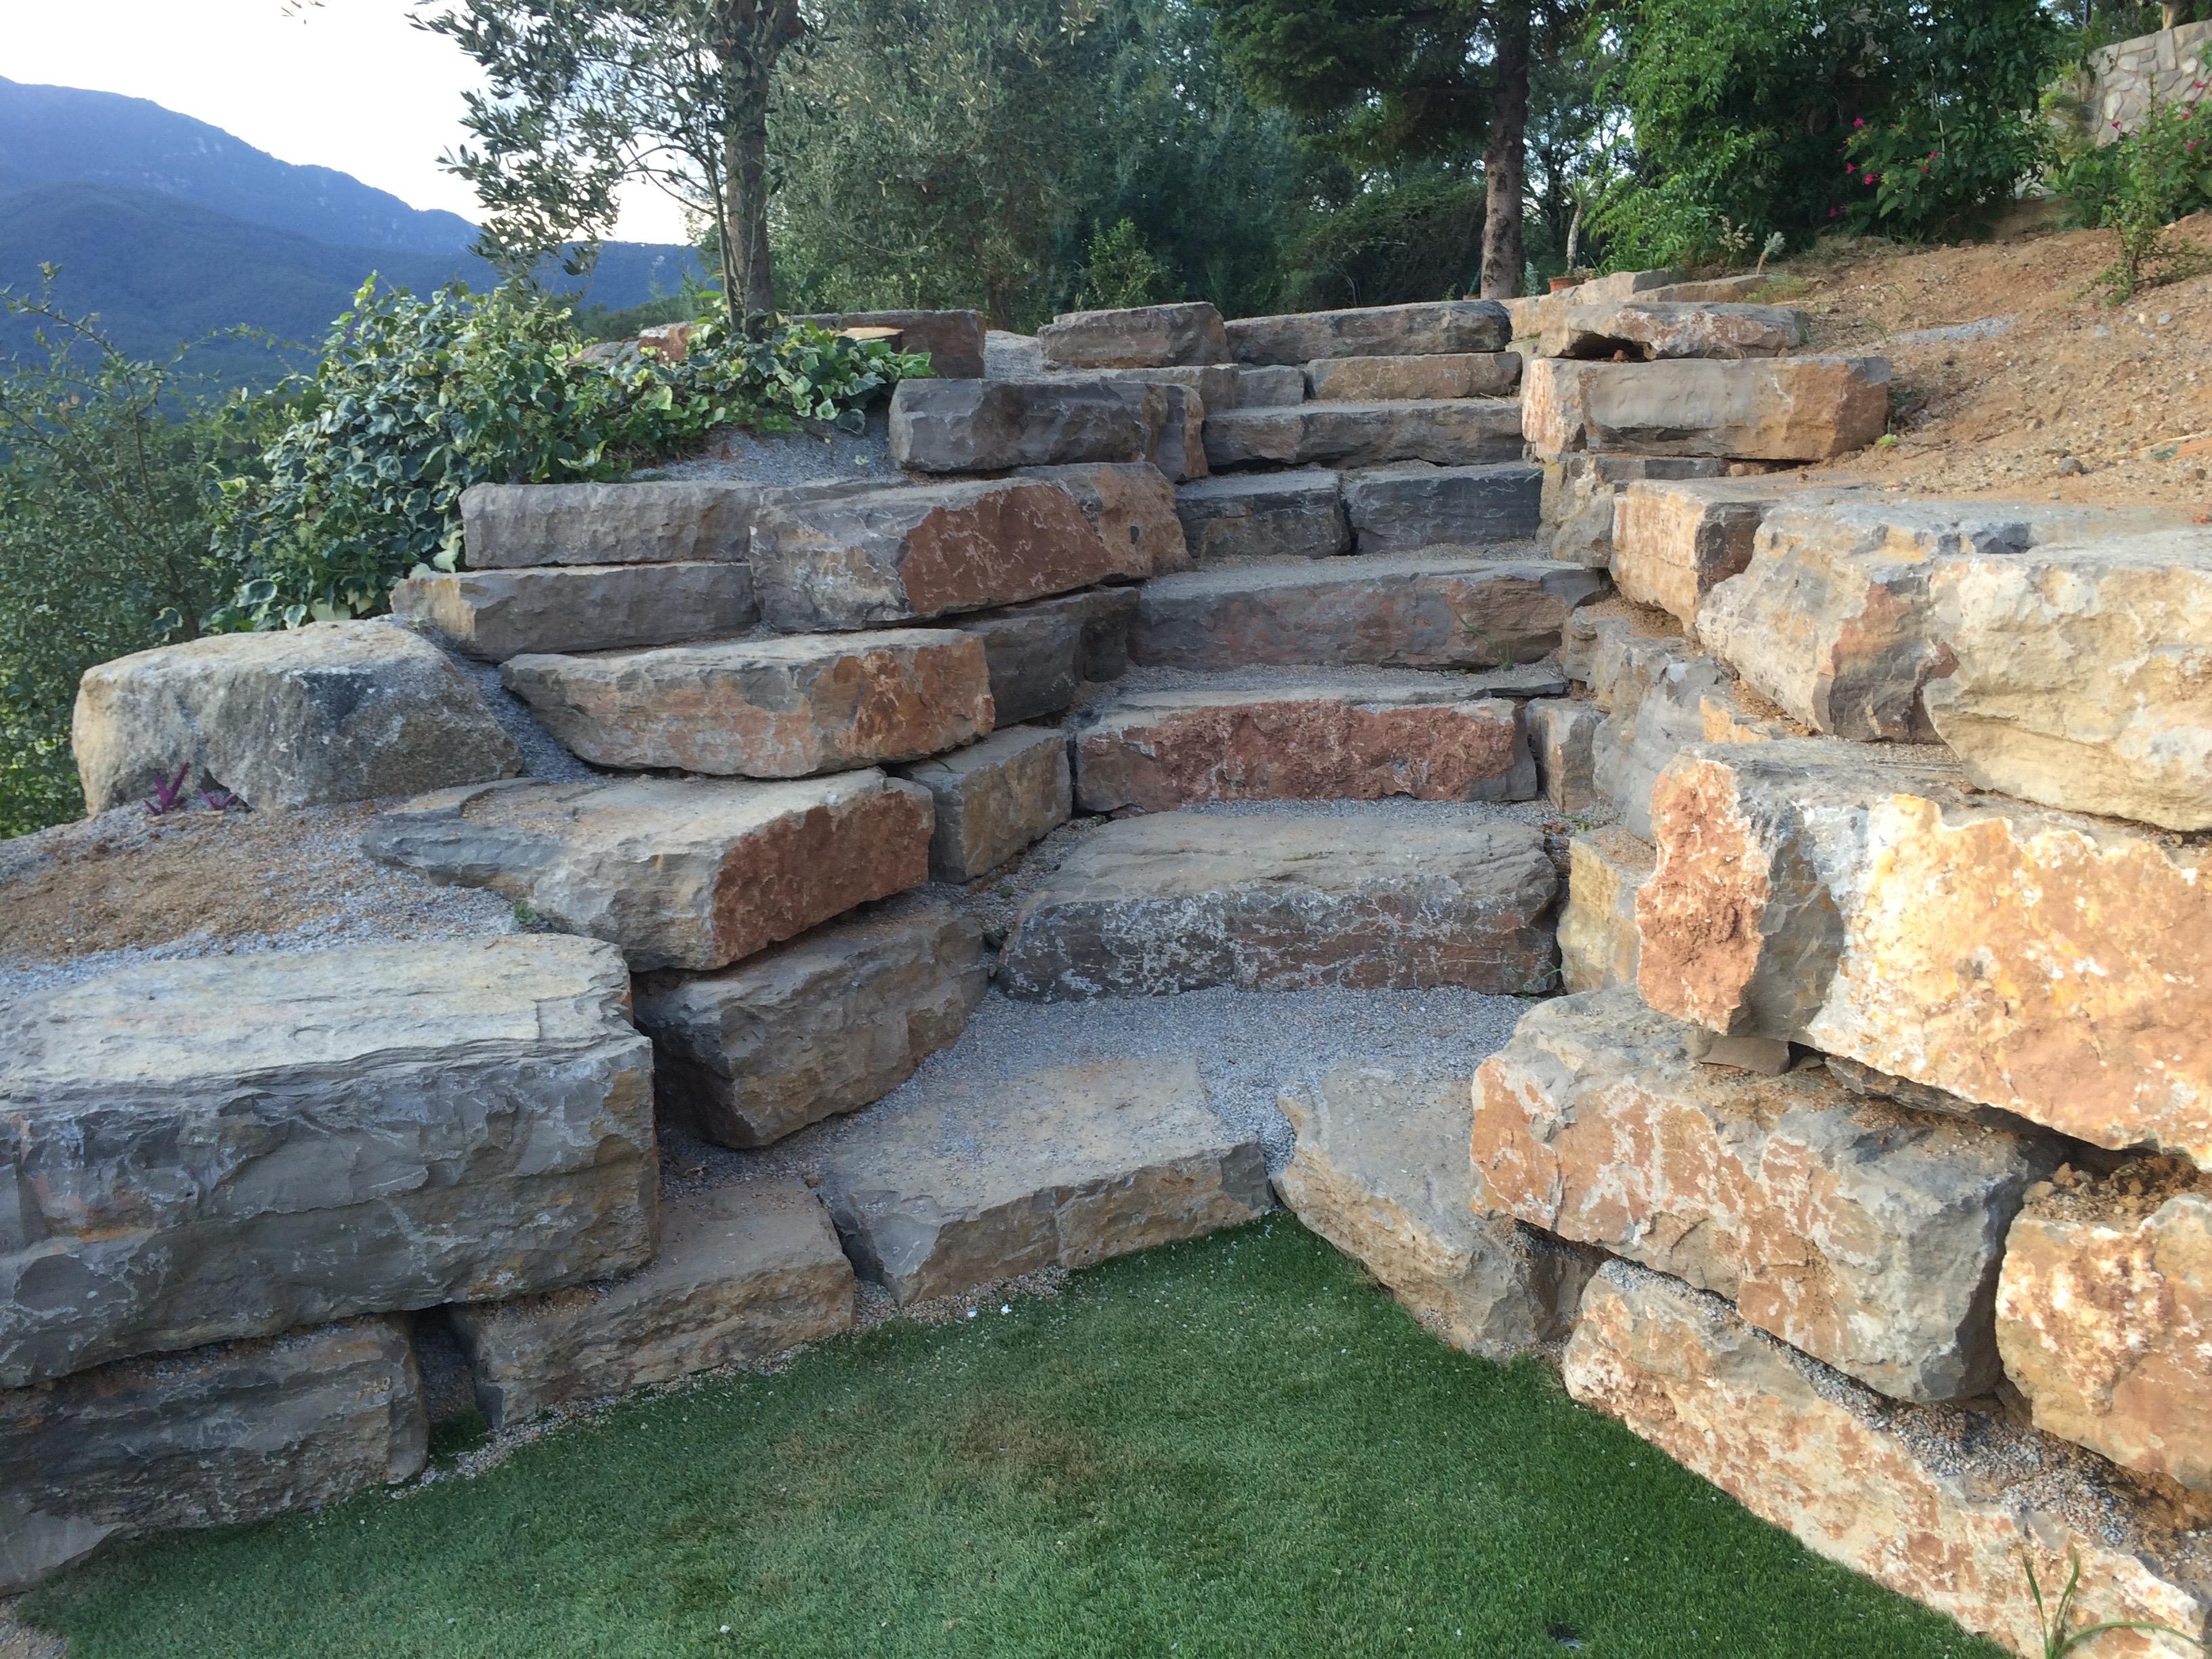 Construcci n de piscinas piscinas aop - Muros de rocalla ...